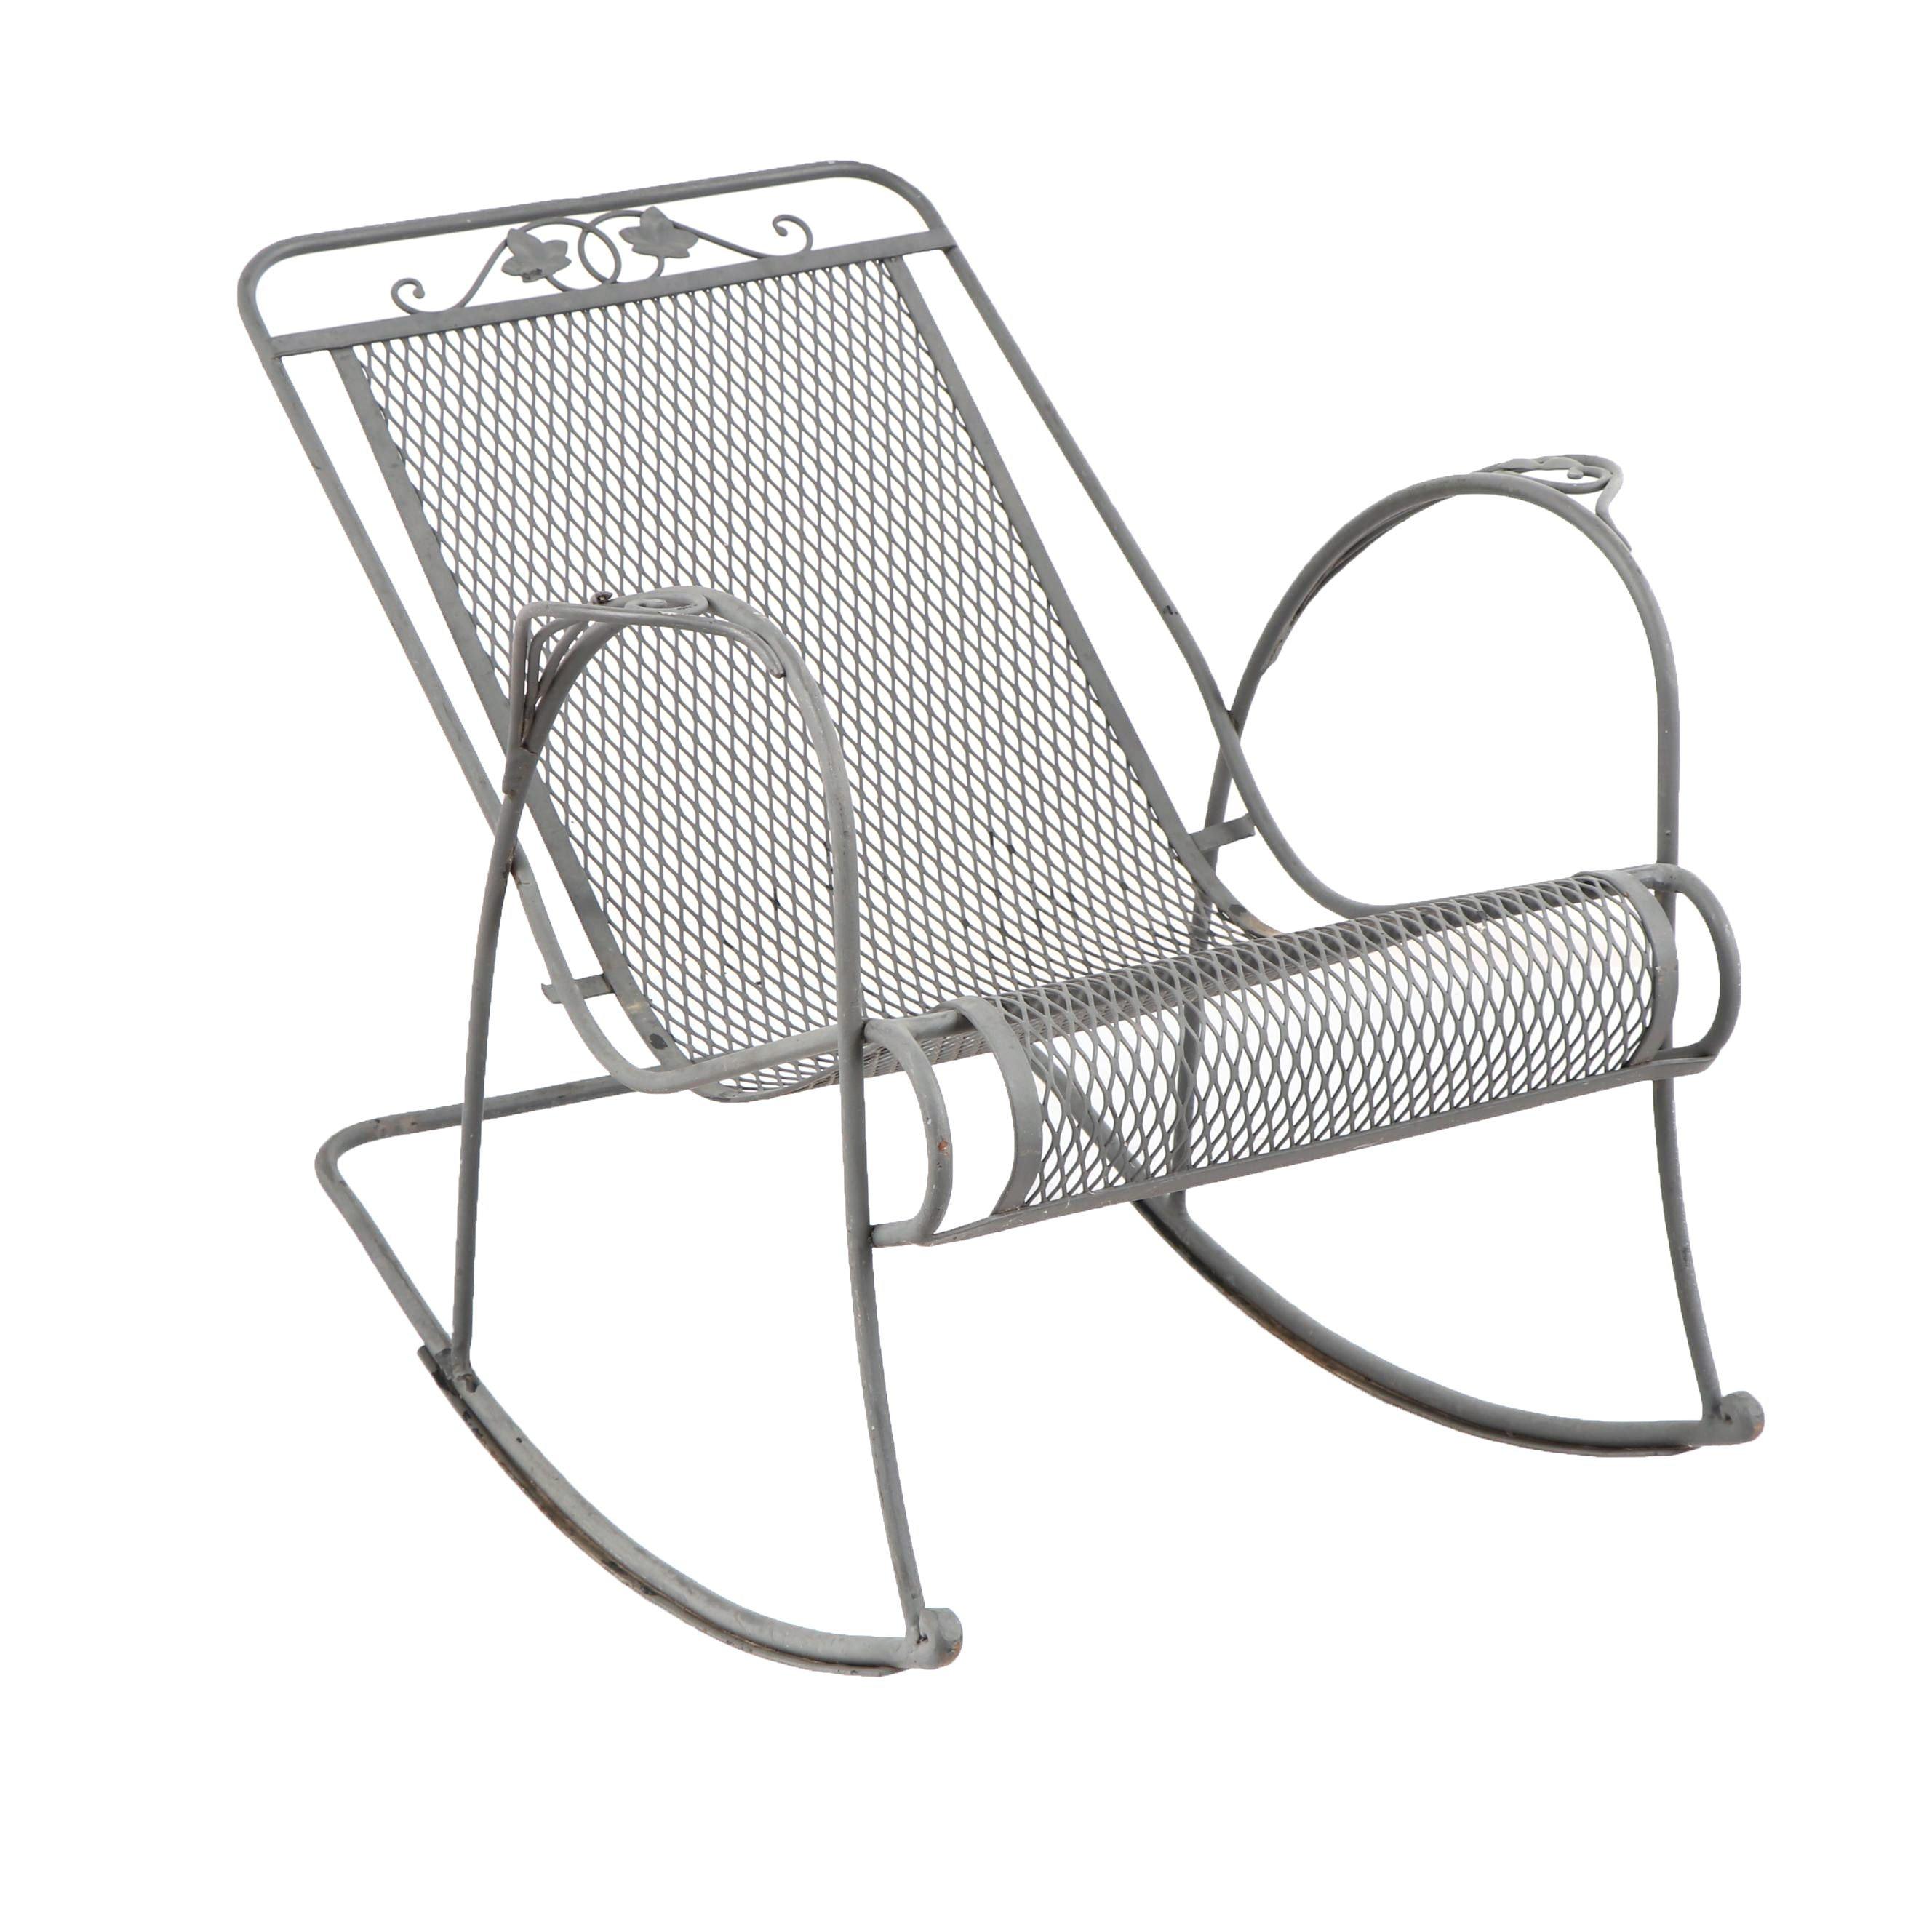 Metal Foliate Motif Patio Rocking Chair